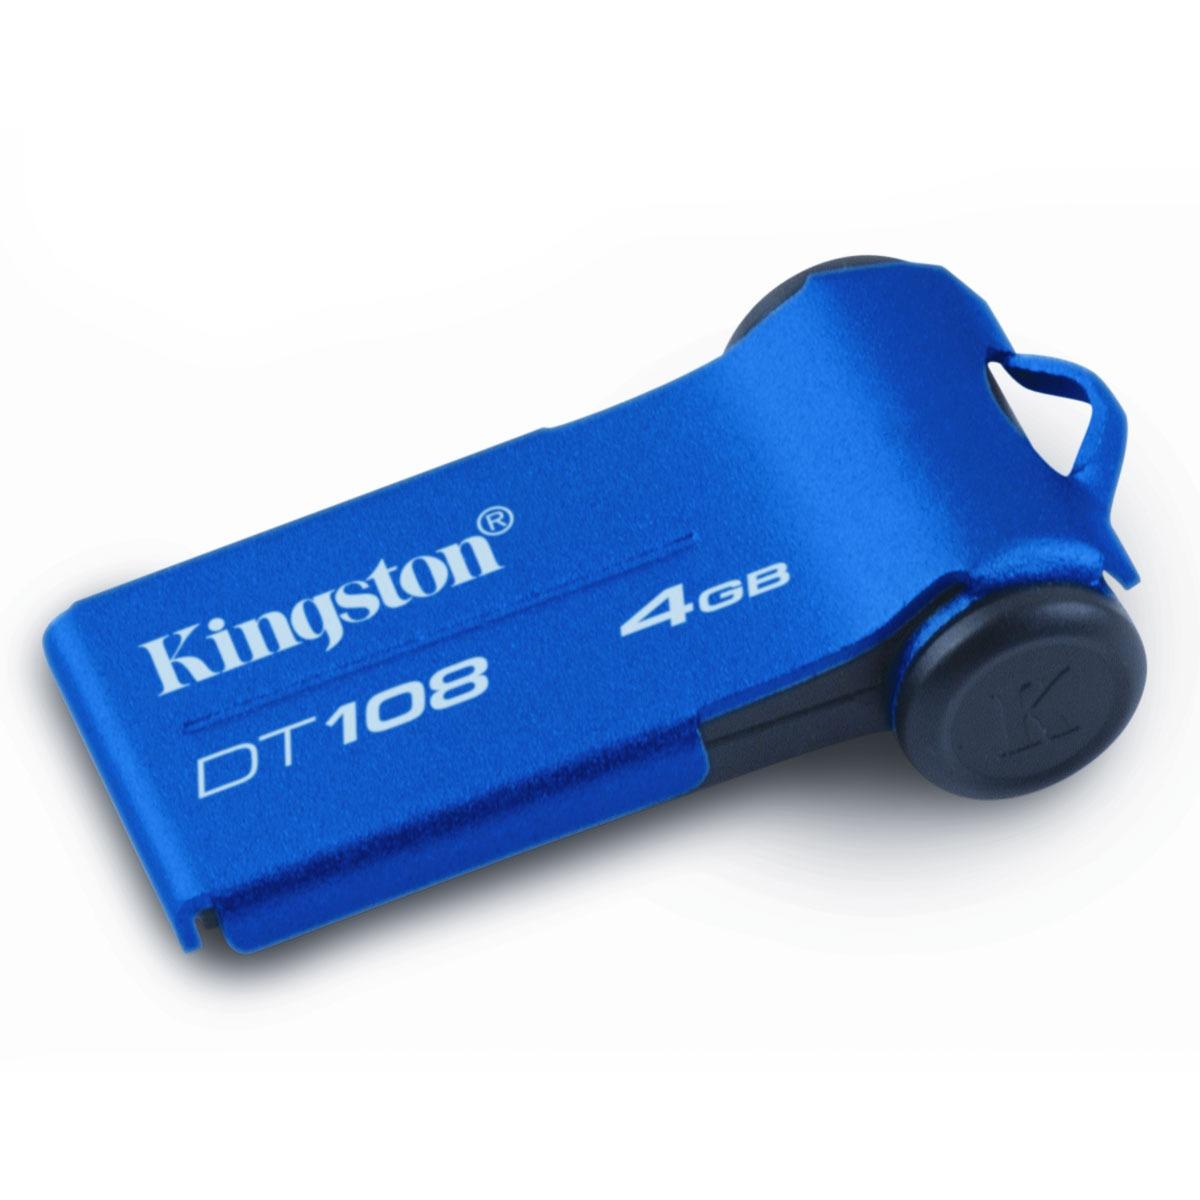 Clé USB Kingston DataTraveler 108 4 Go Kingston DataTraveler 108 4 Go - USB 2.0 (garantie constructeur 5 ans)